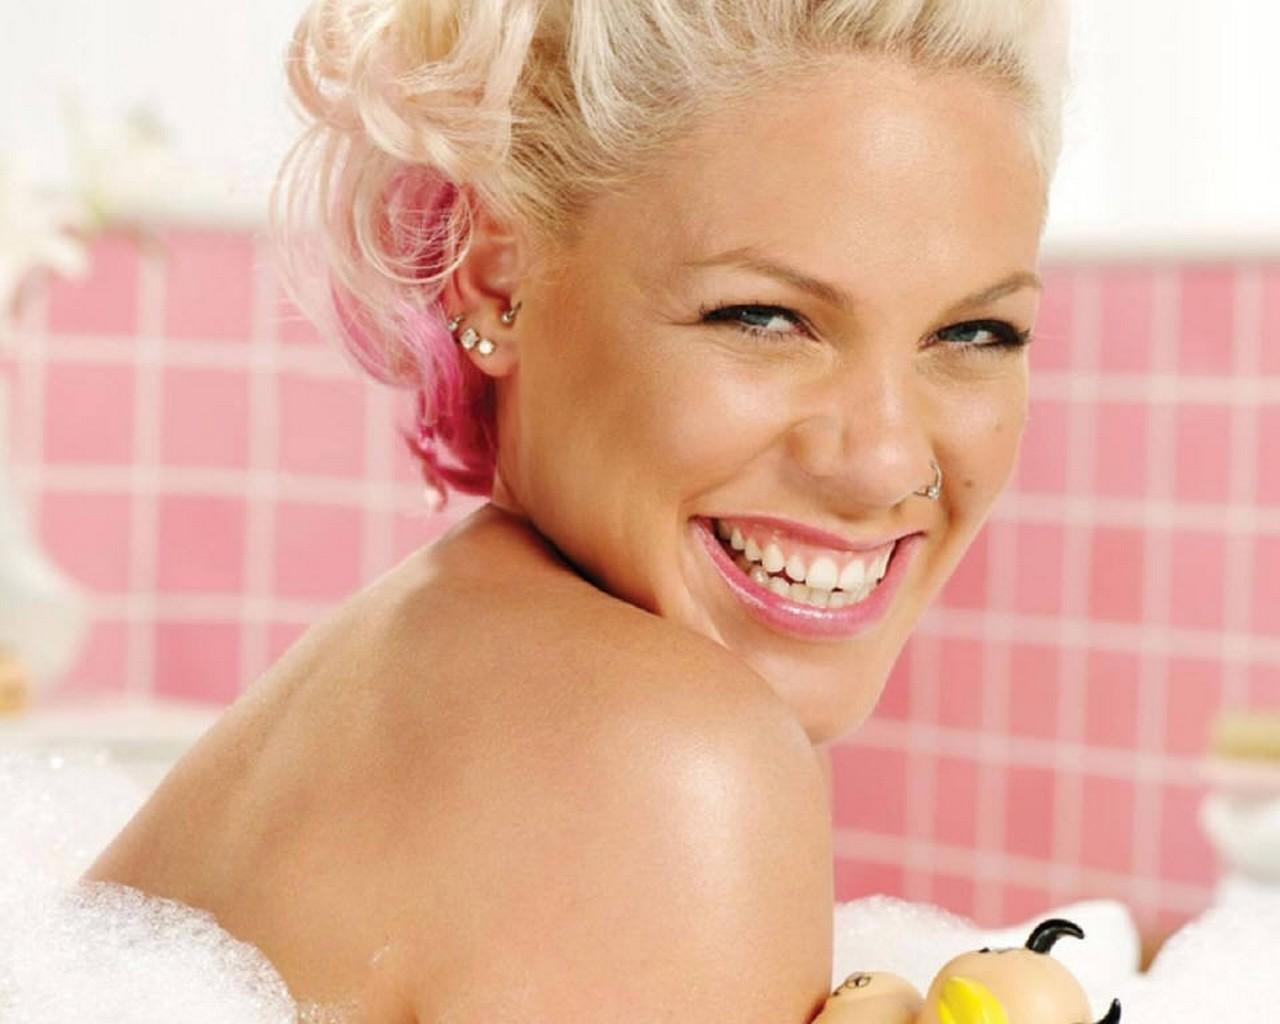 P Nk Hairstyles: Women Crush -GirlfriendsMeet Blog